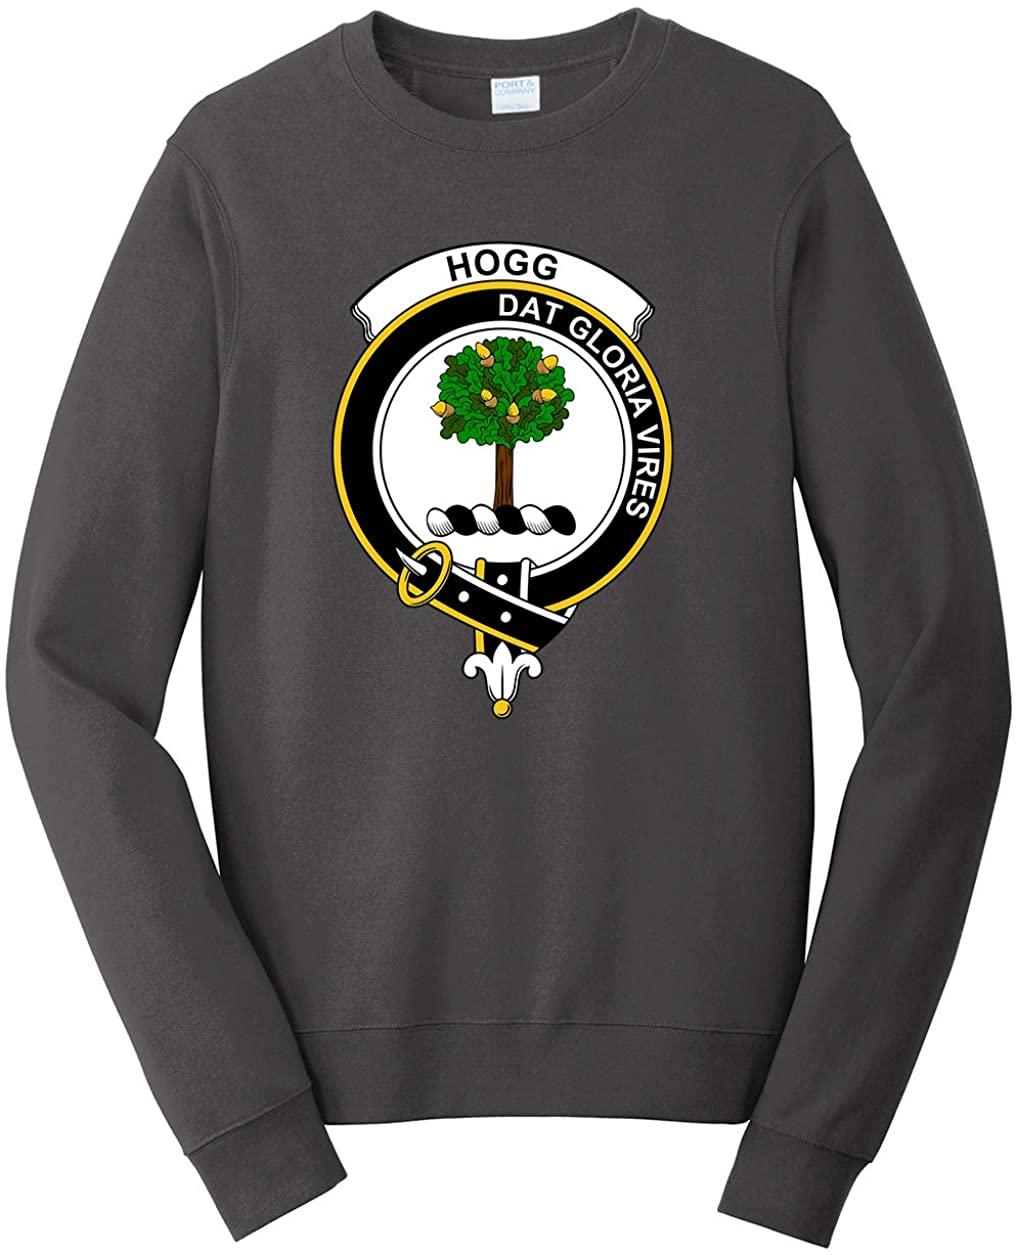 Tenacitee Unisex Scottish Clan Crest Badge Hogg Sweatshirt